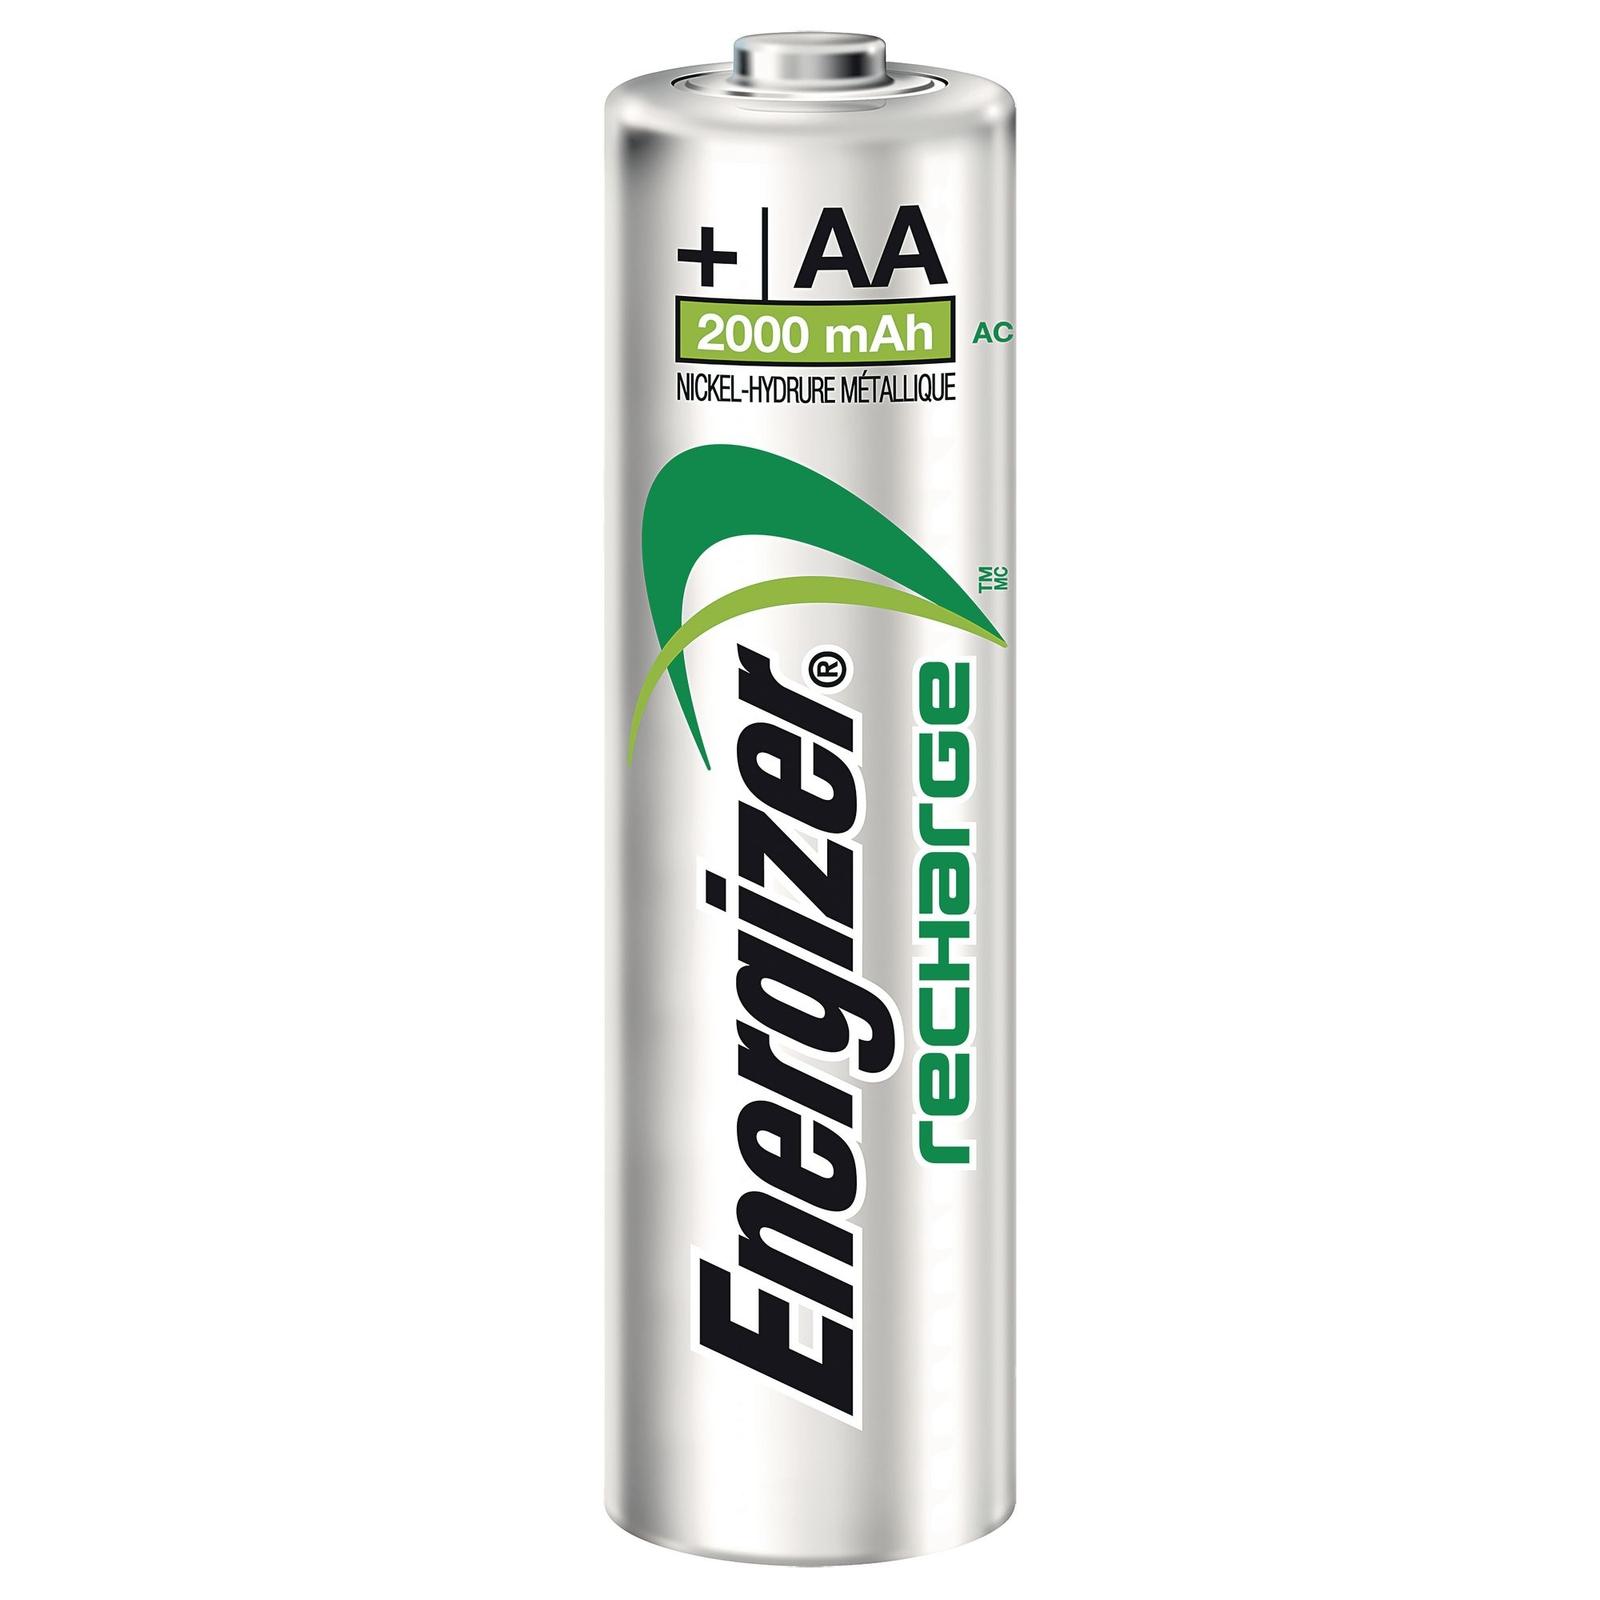 Nickel Metal Hydride Battery : Product gls educational supplies